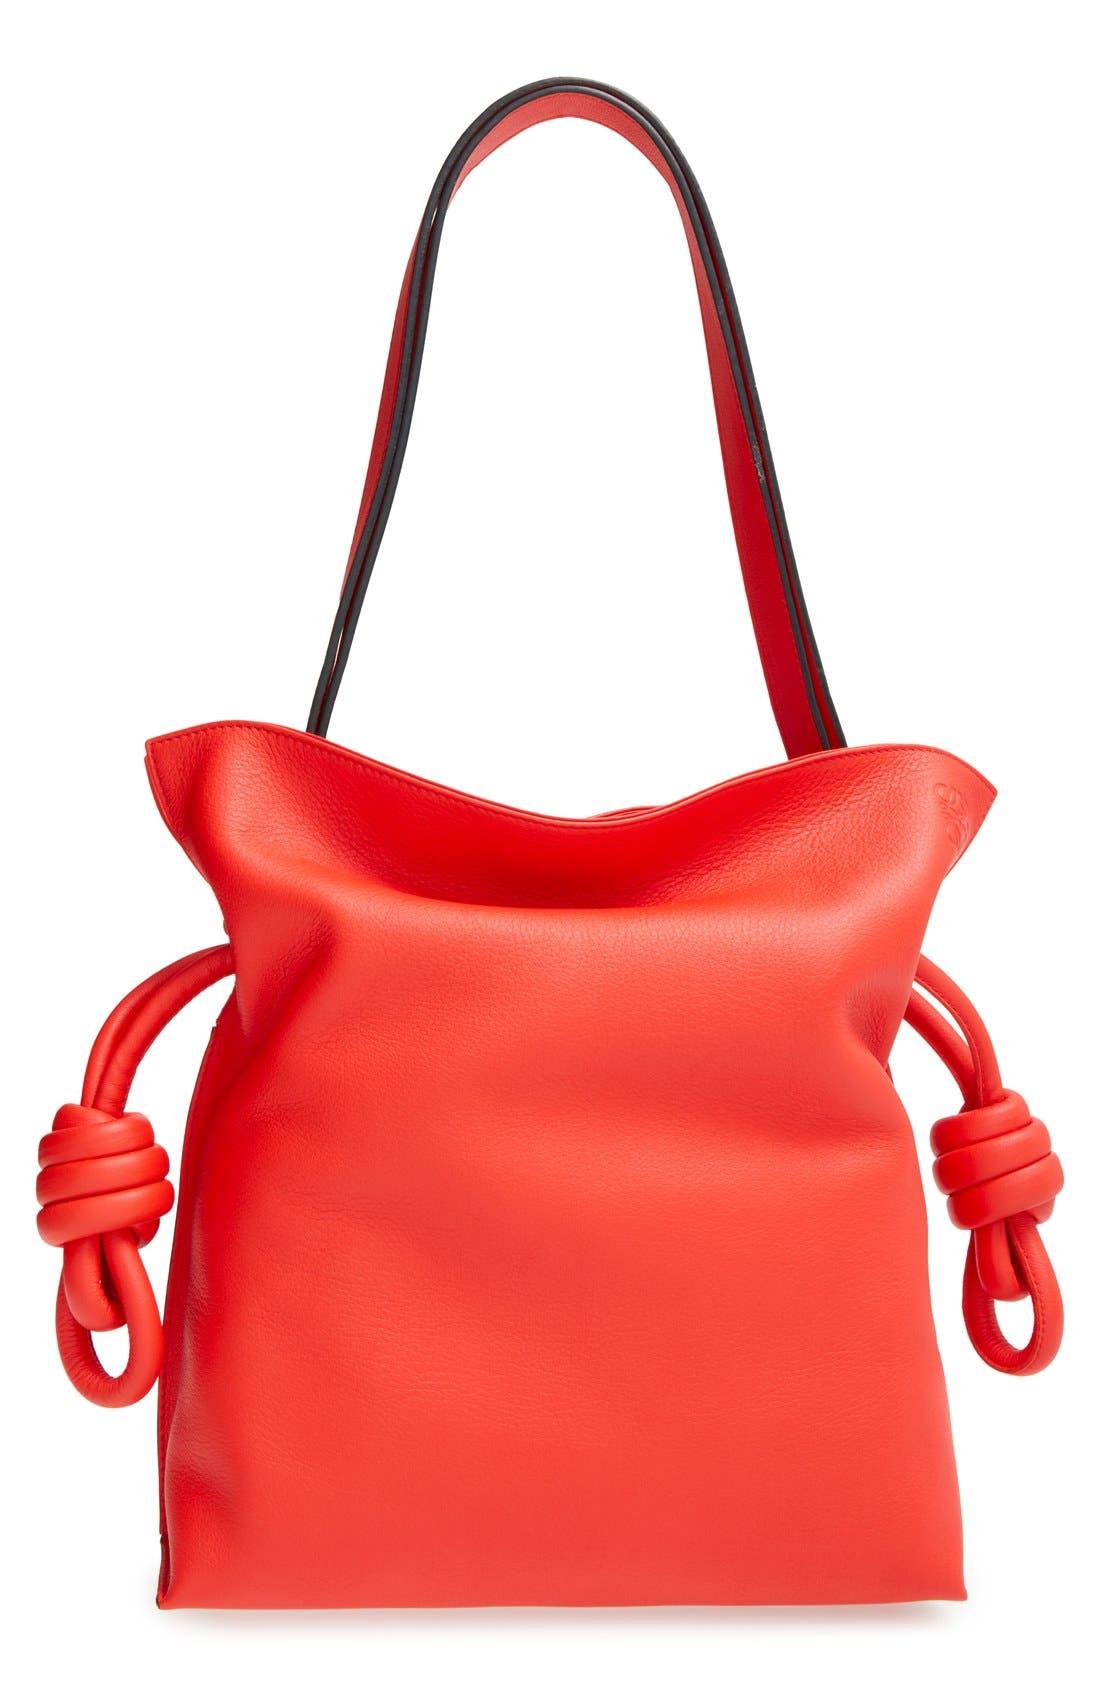 LOEWE Small Flamenco Knot Calfskin Leather Bag